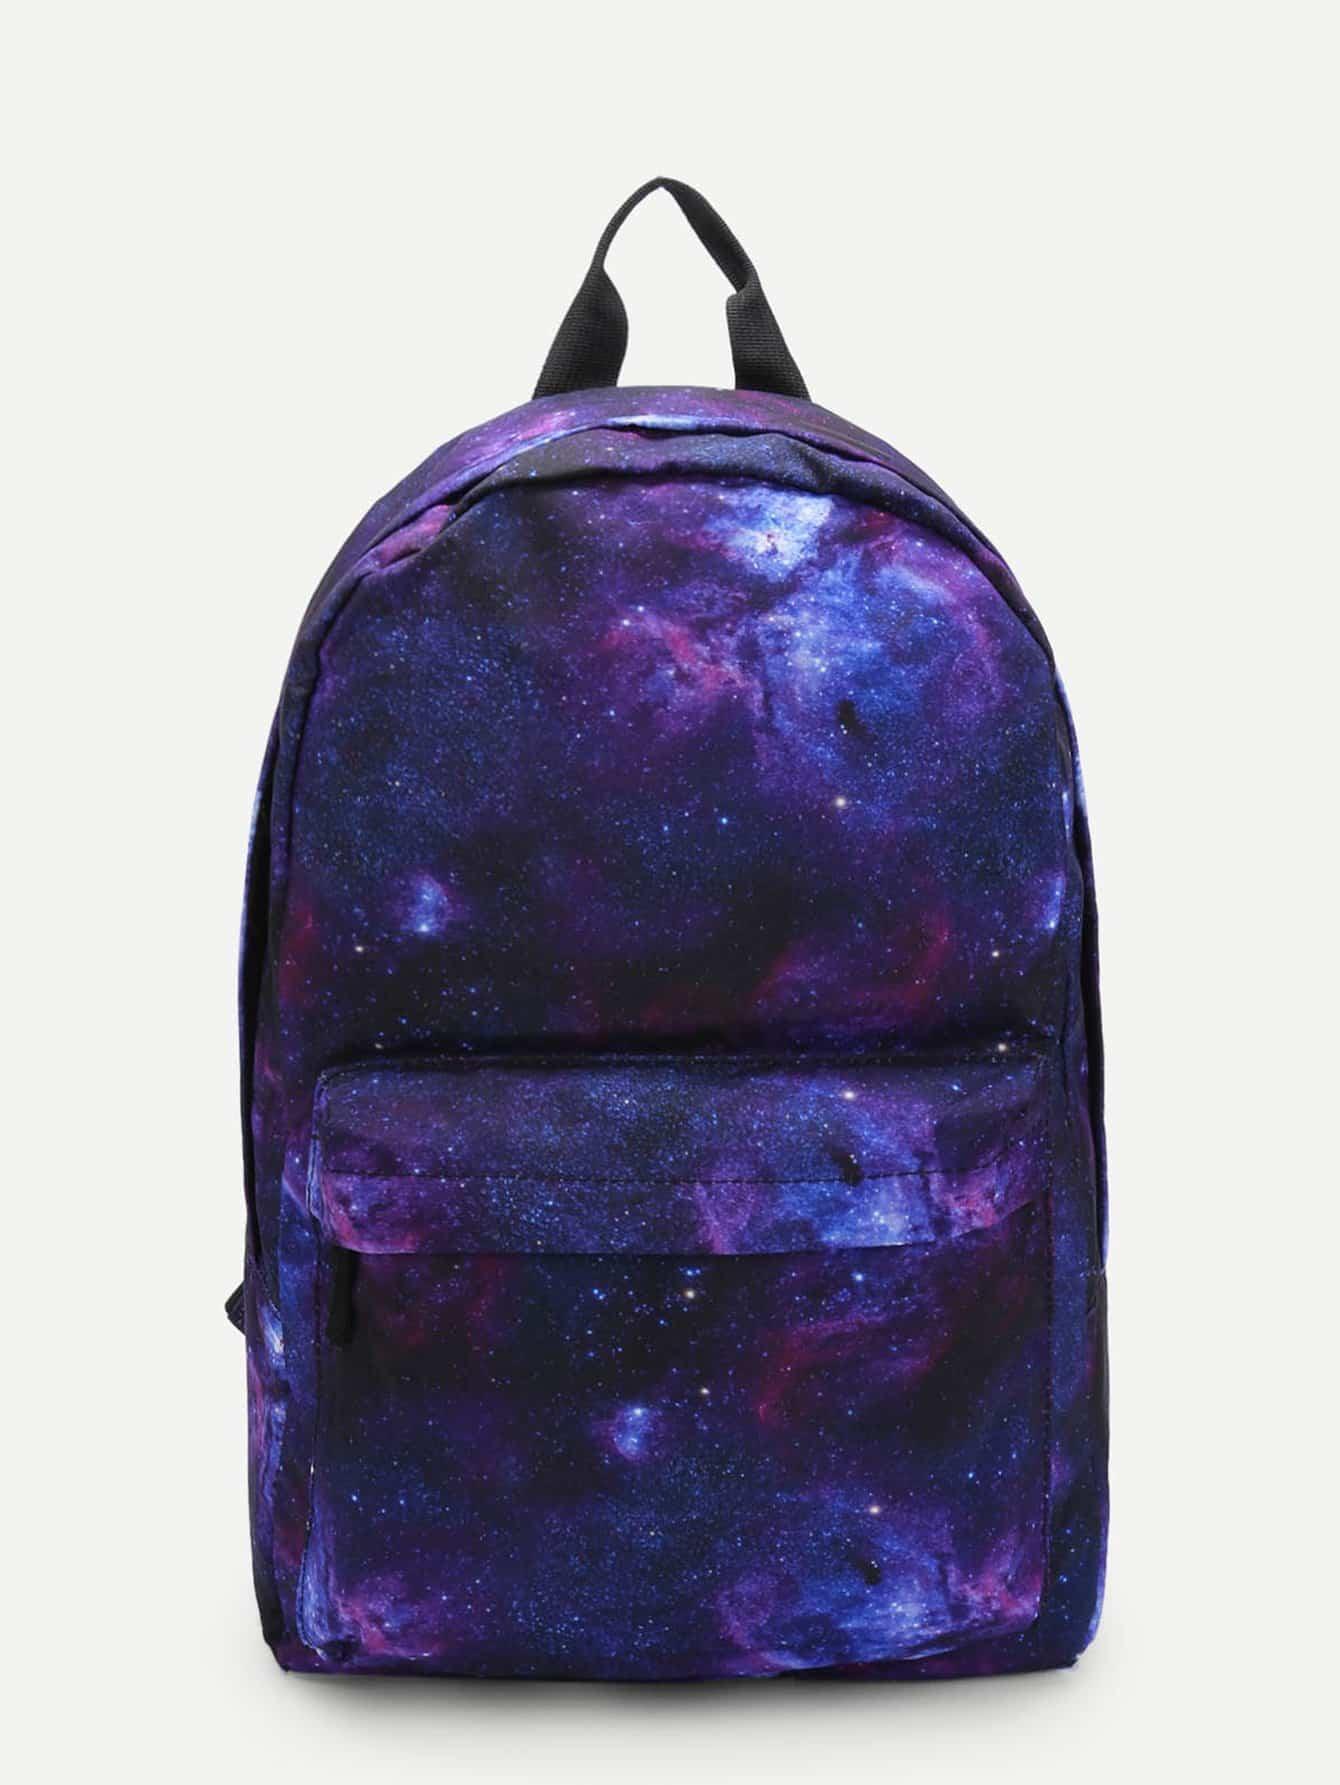 Starry Sky Backpacks Bag redlai starry sky marble camouflage hard